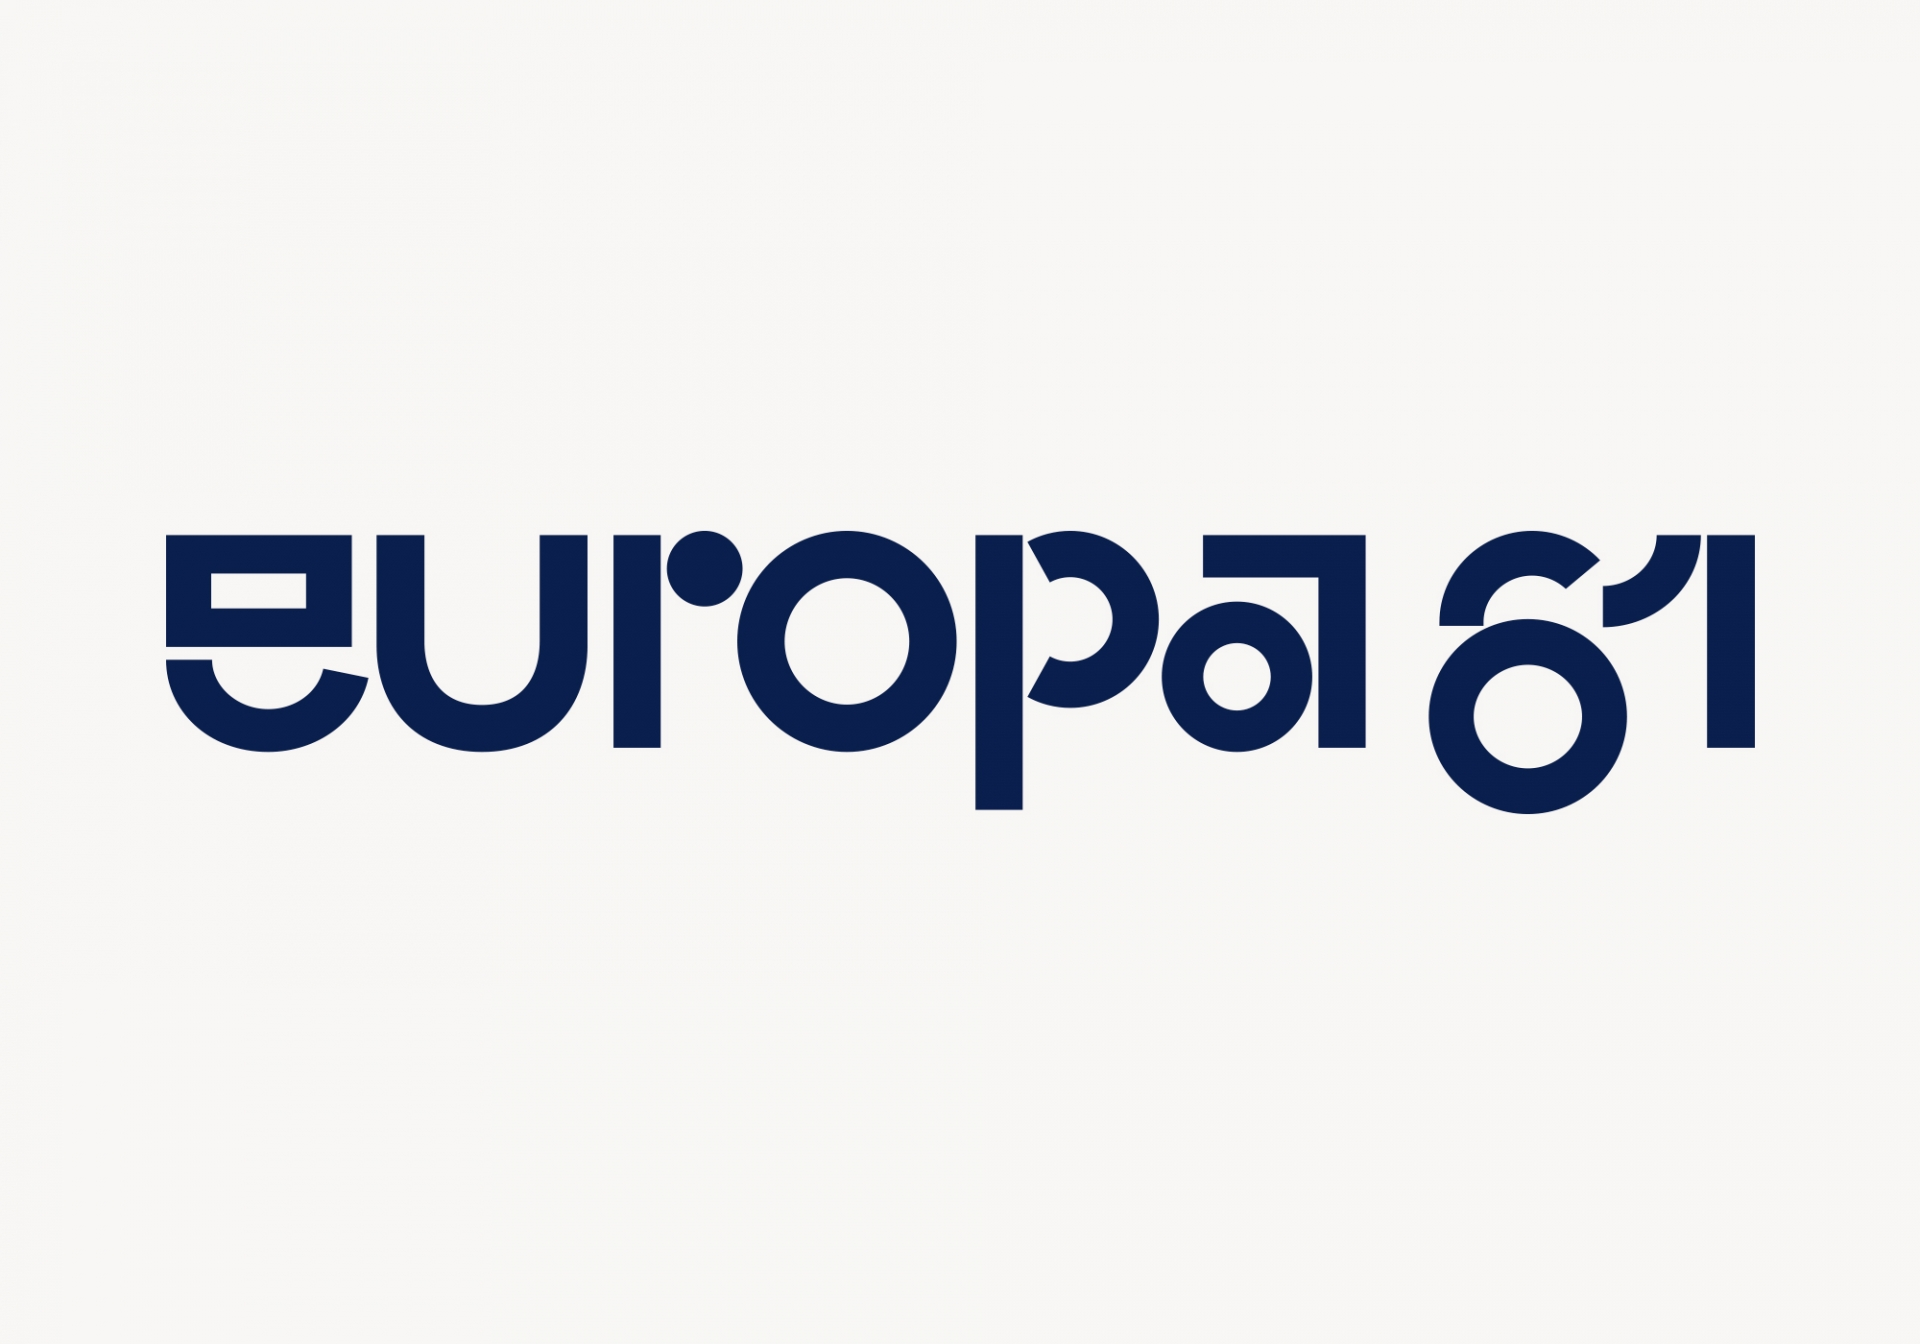 Europa'61